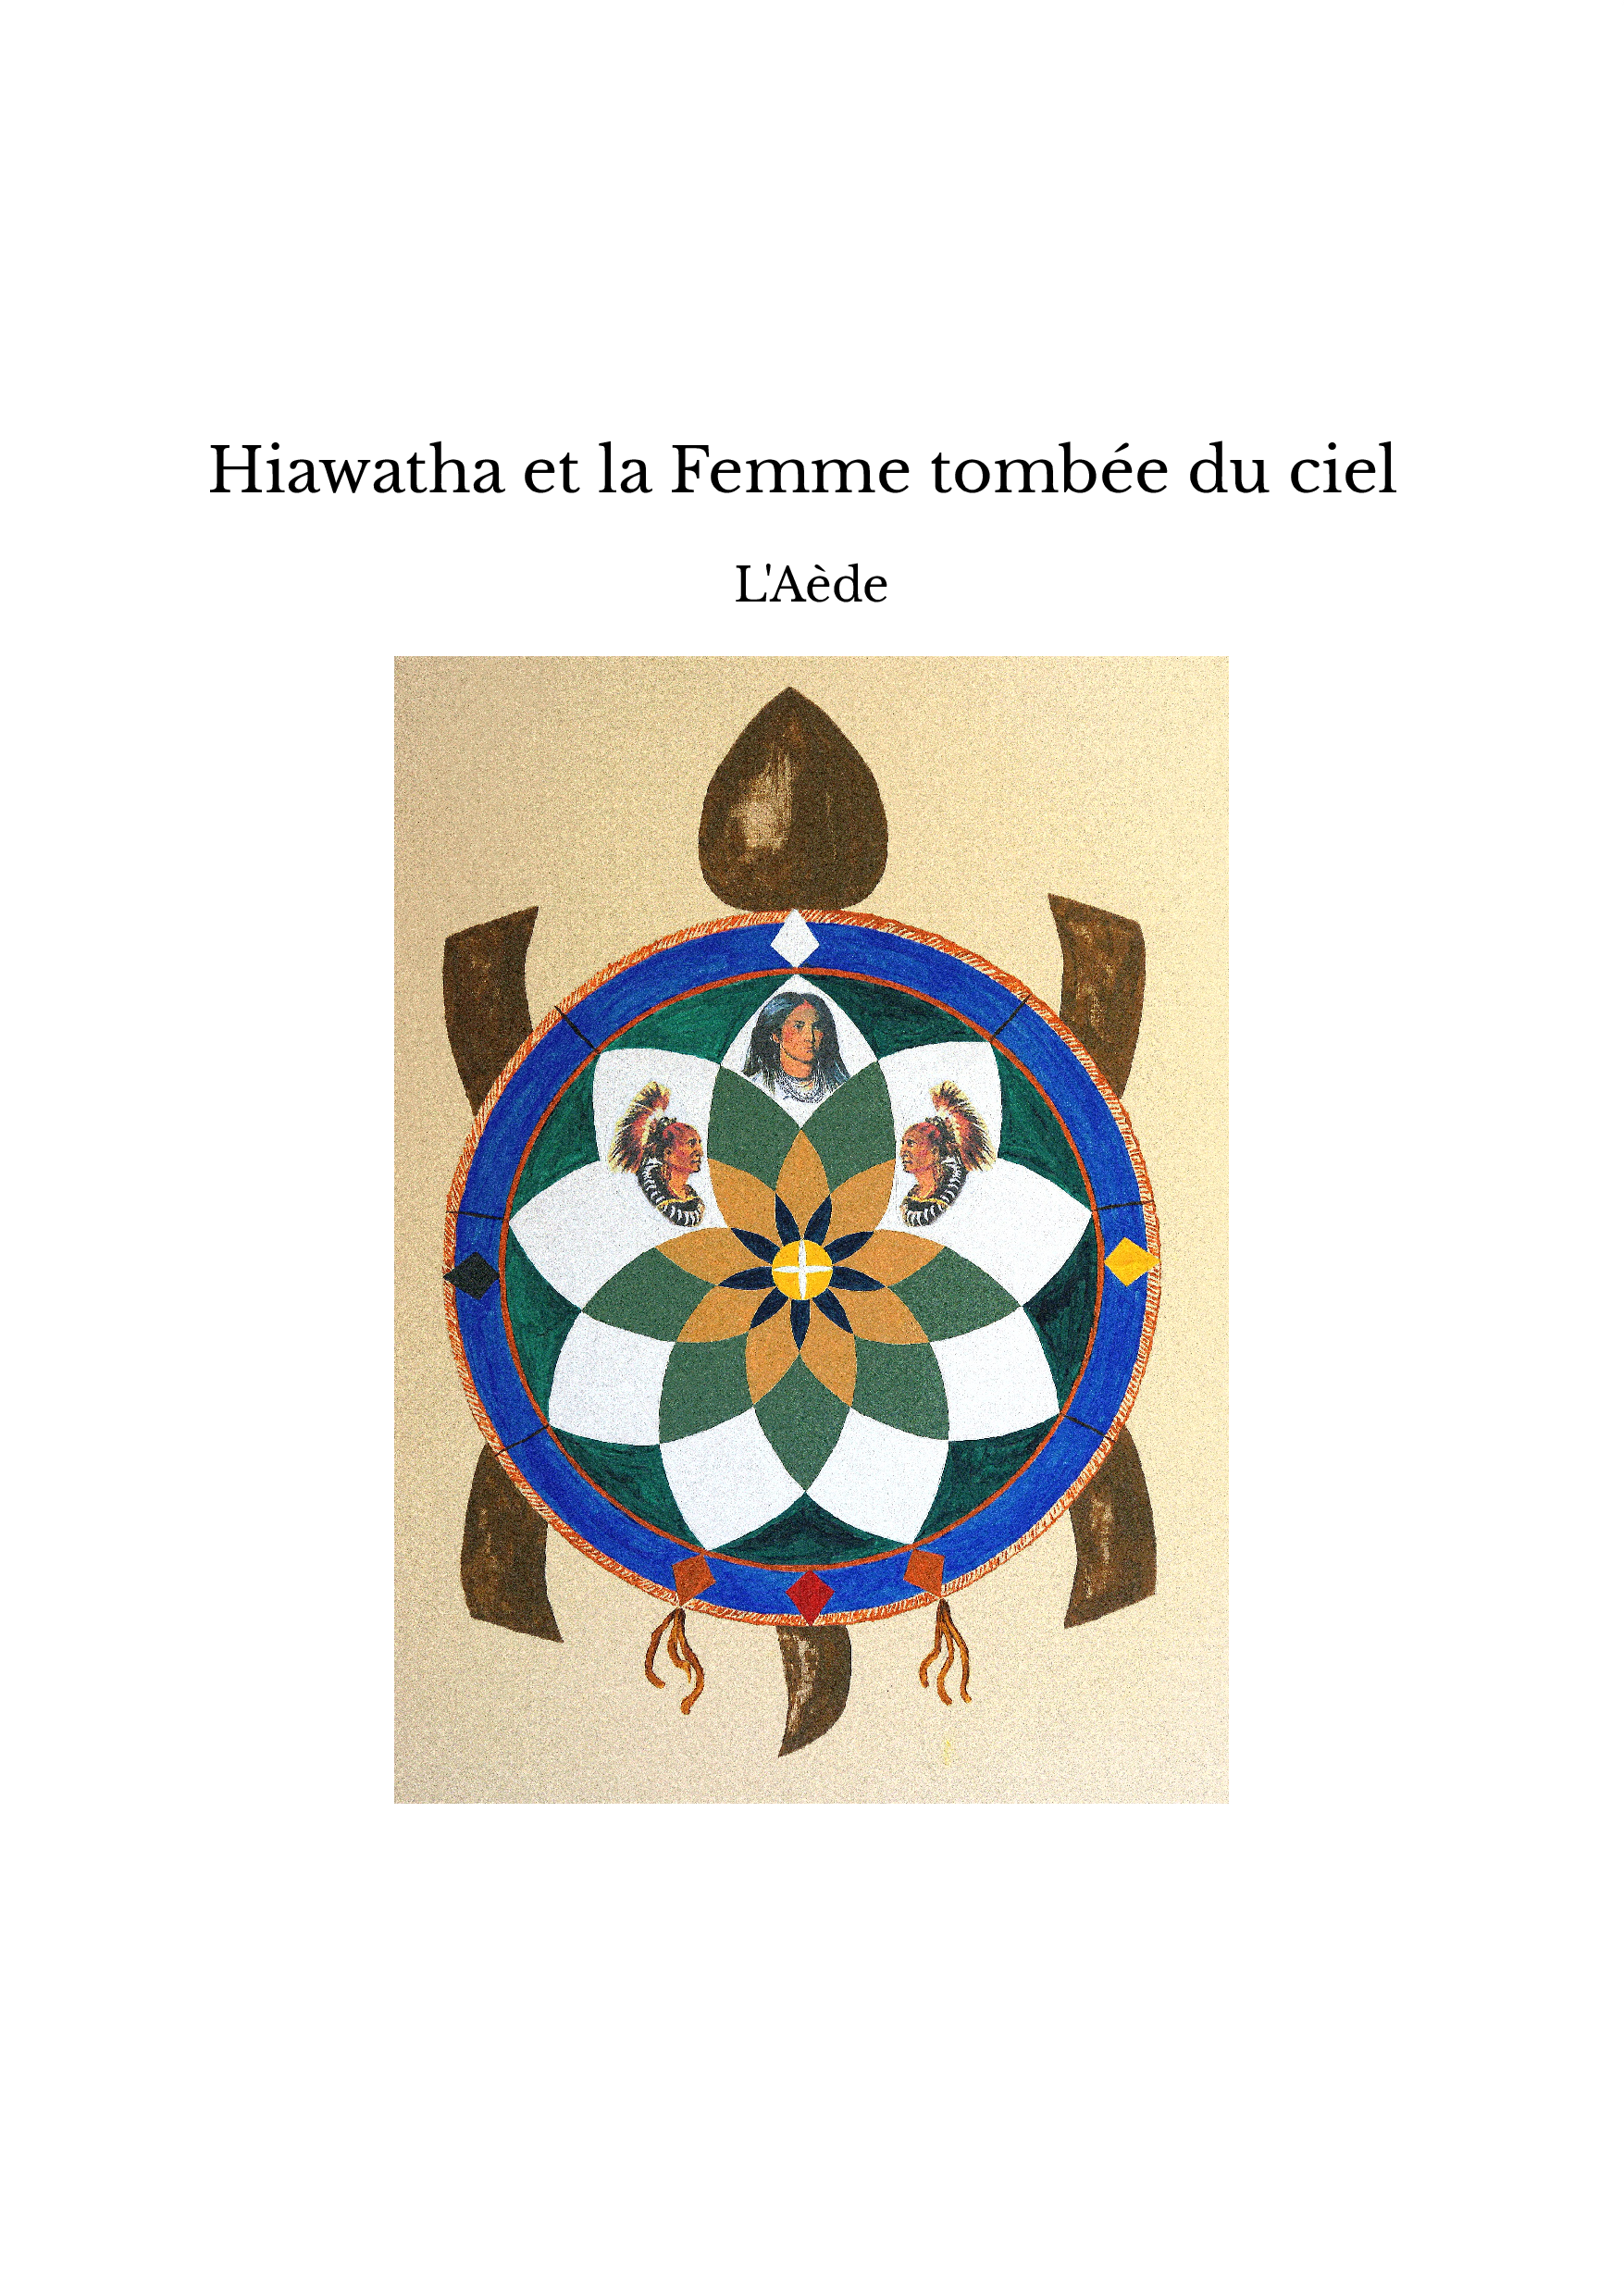 Hiawatha et la Femme tombée du ciel